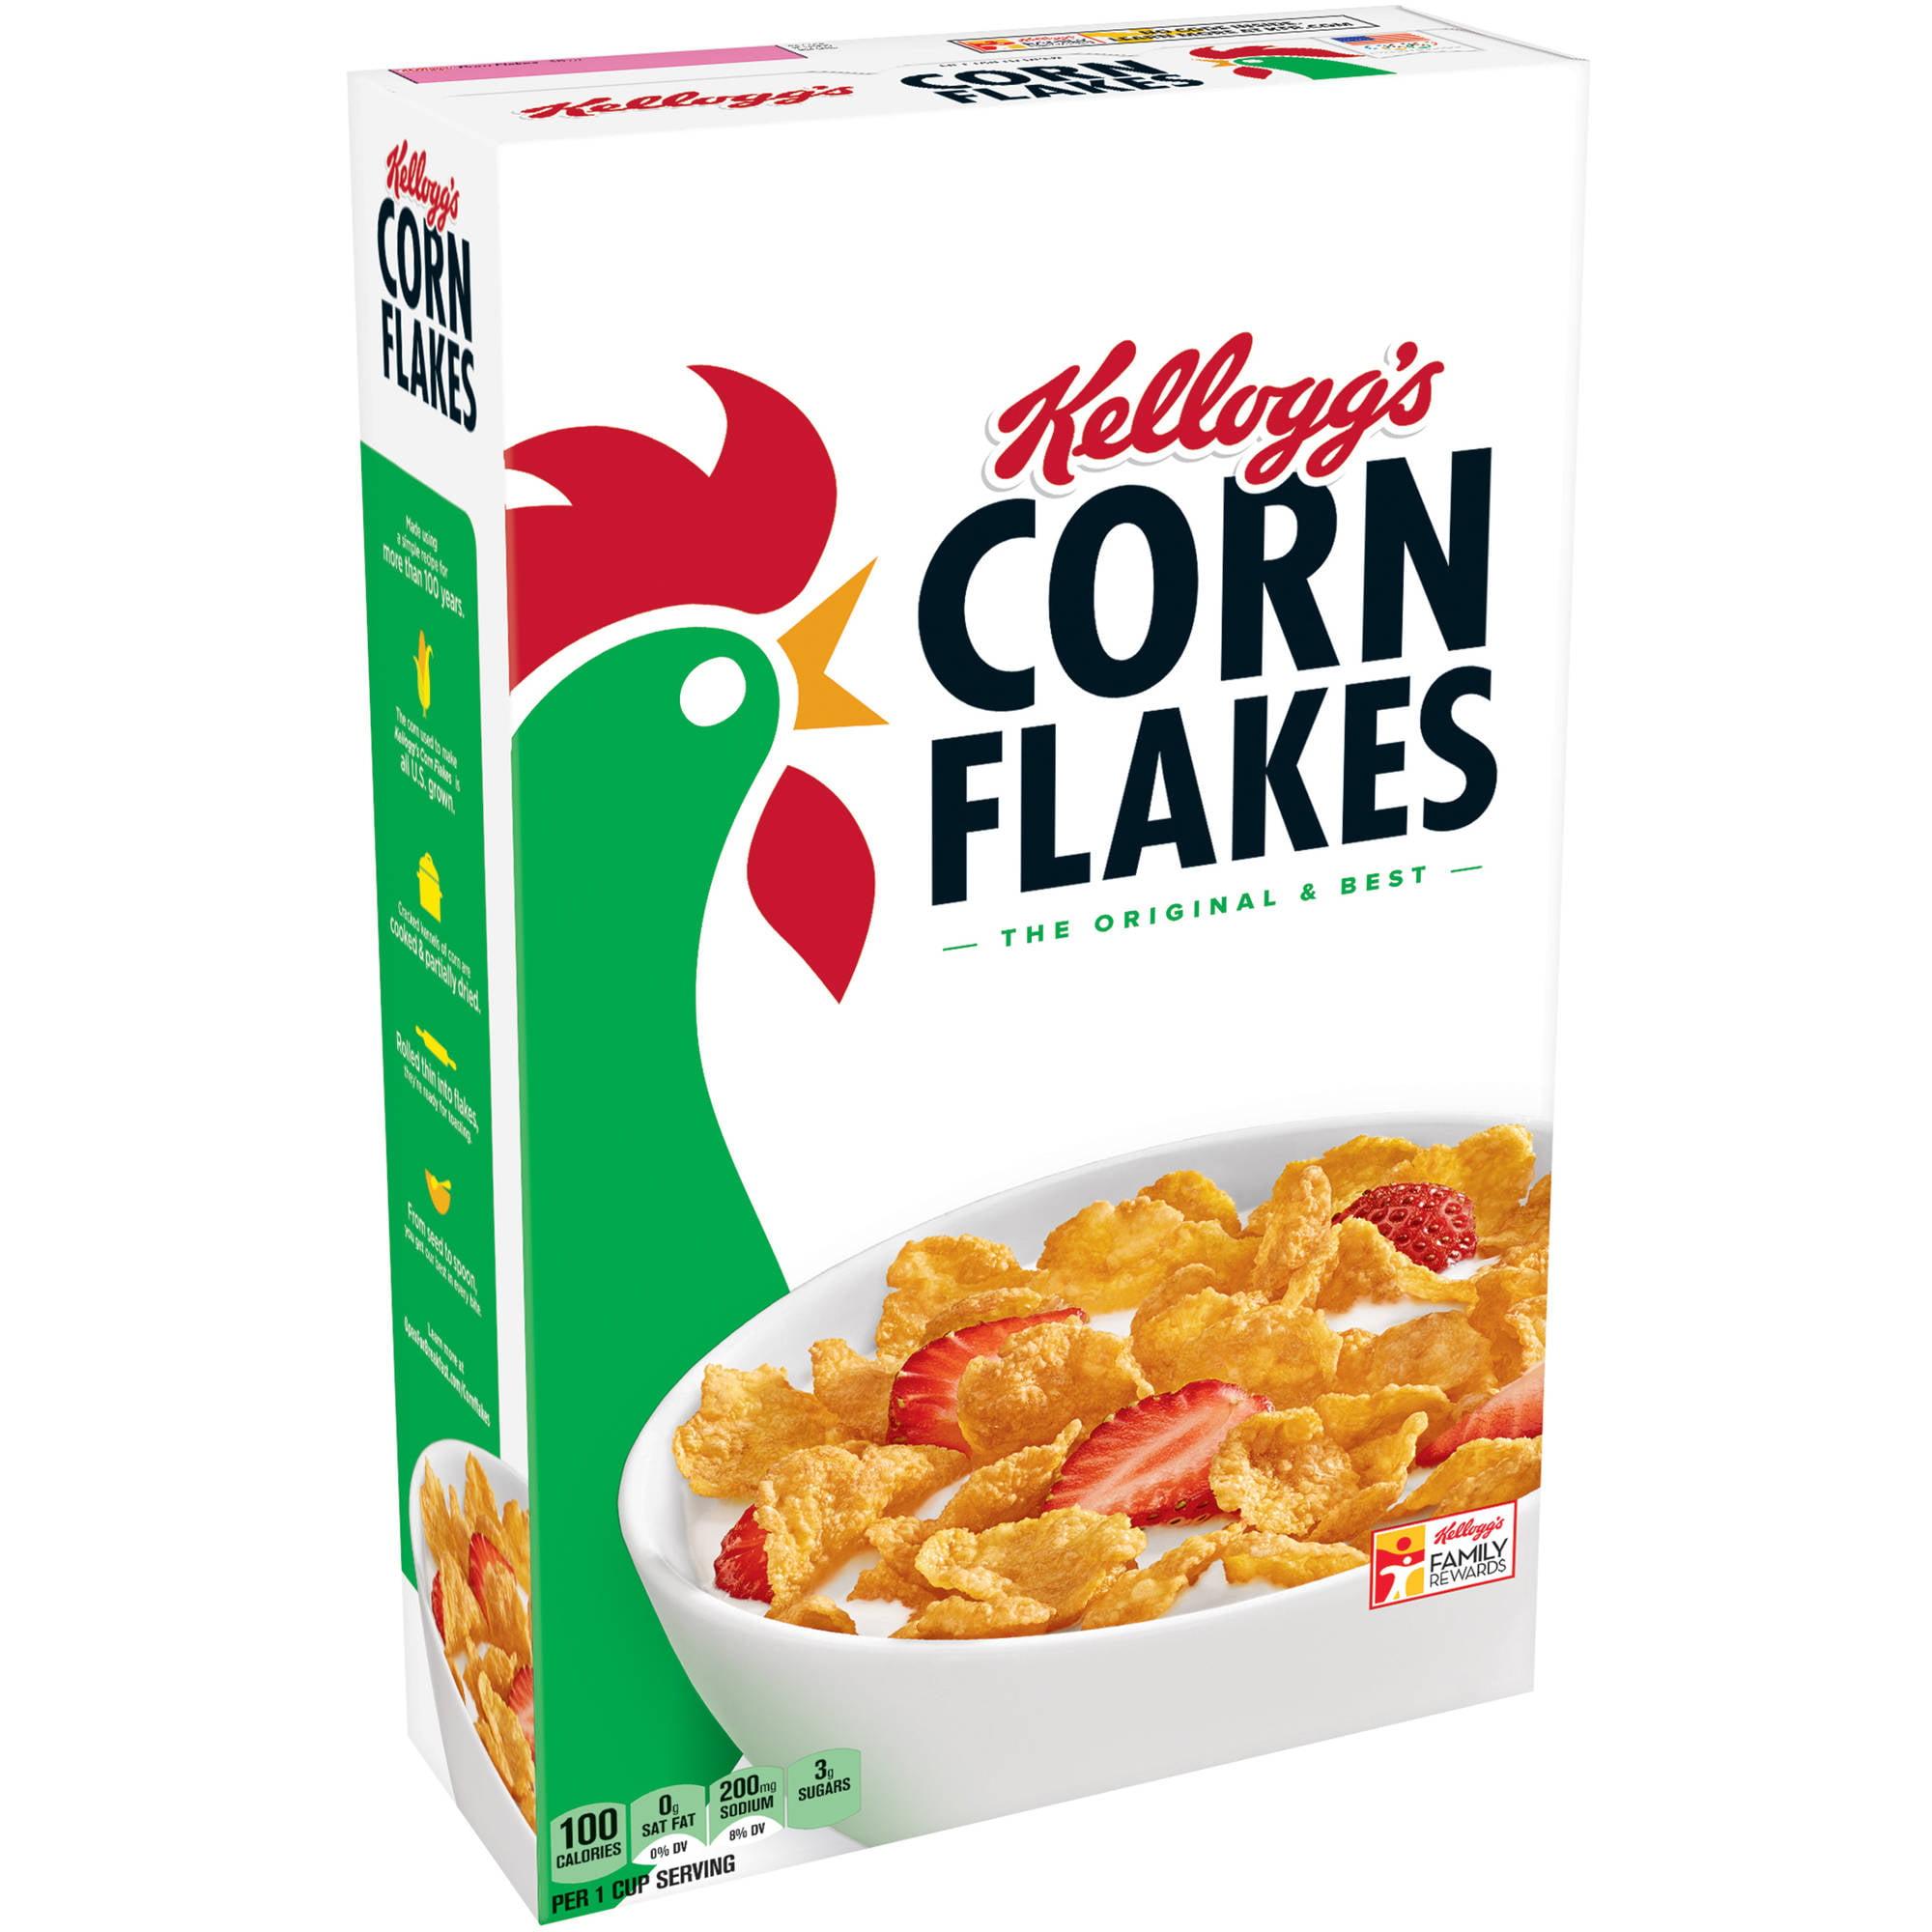 Kellogg's Corn Flakes Cereal The Original, 24 ounce